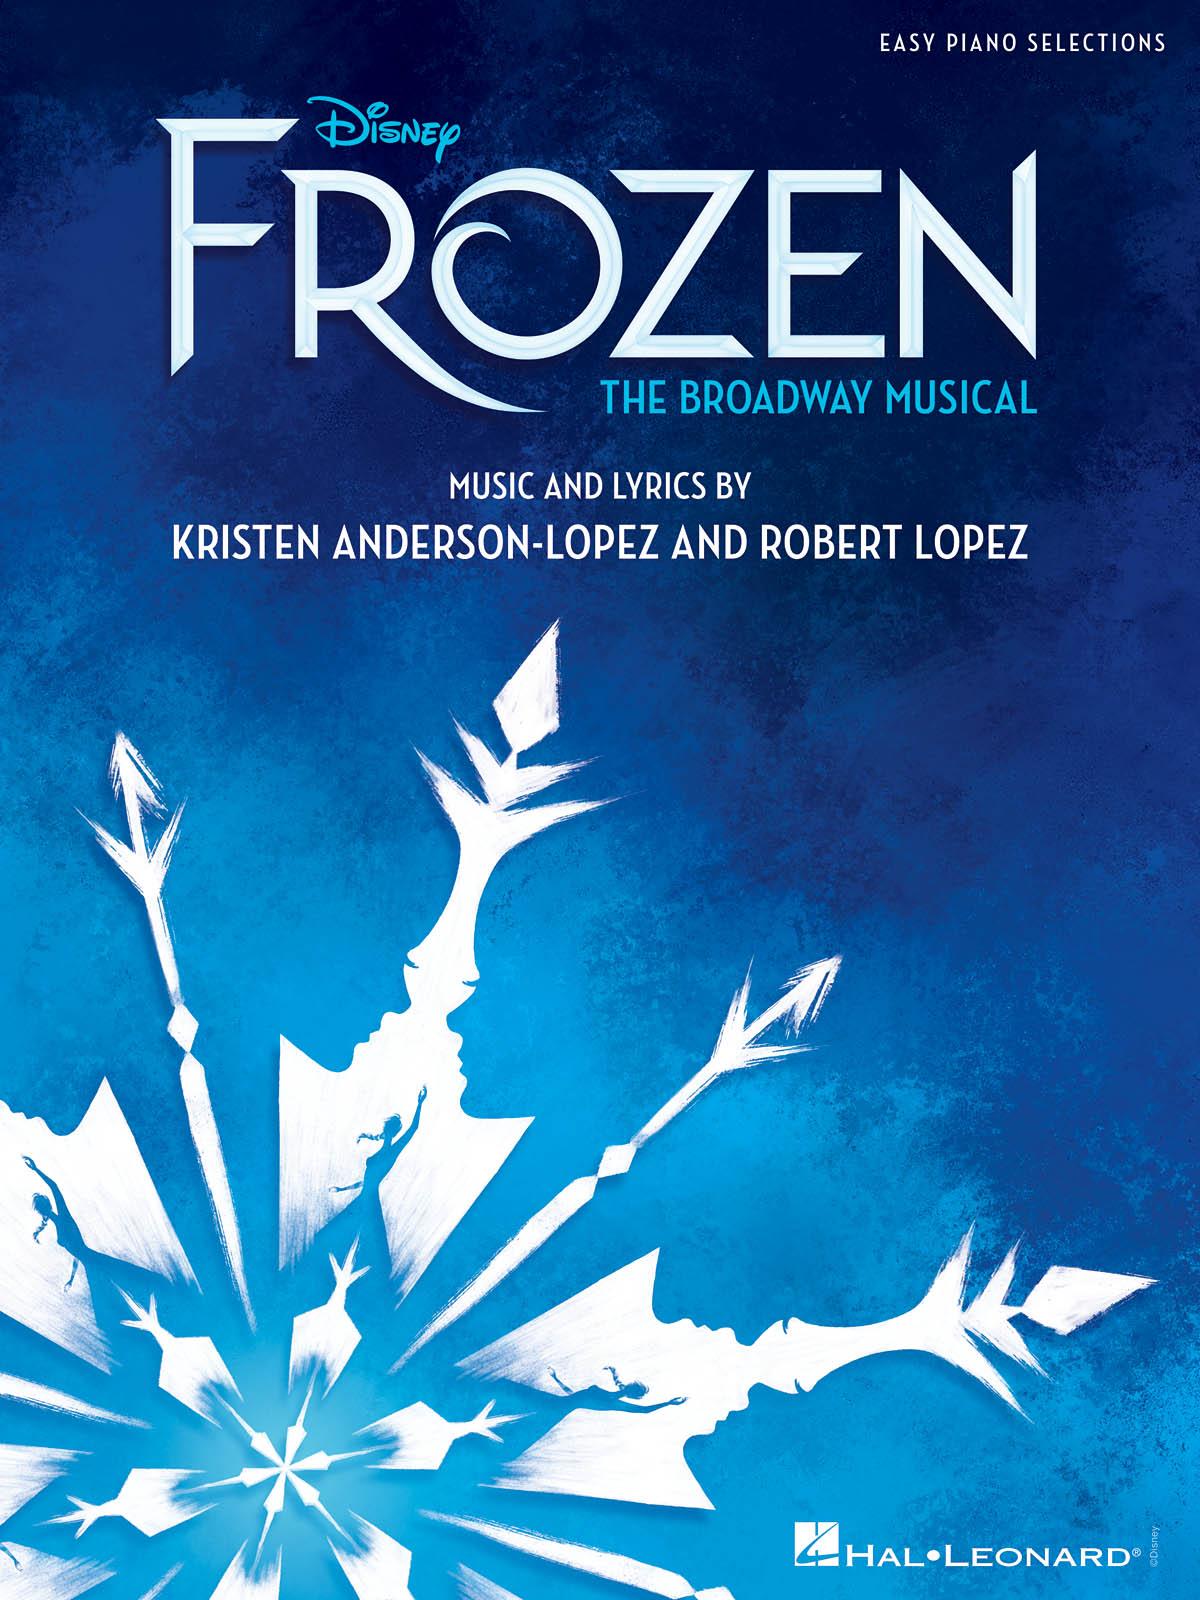 Disney's Frozen - The Broadway Musical - Easy Piano Selections (La reine des neiges)